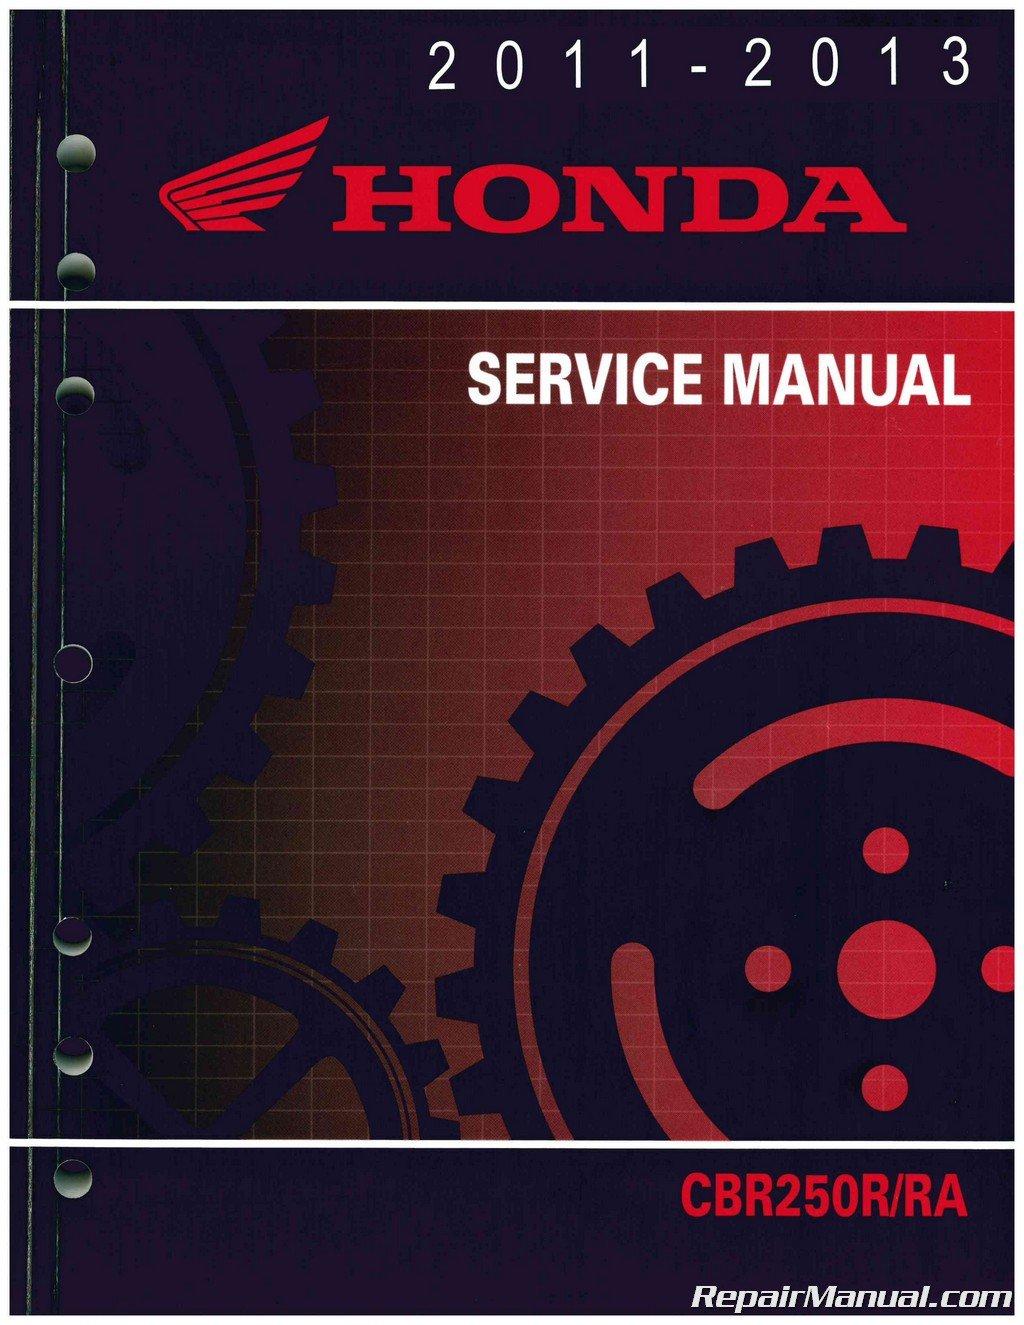 61KYJ02 2011-2013 CBR250R/RA Motorcycle Service Manual Honda: Manufacturer:  Amazon.com: Books